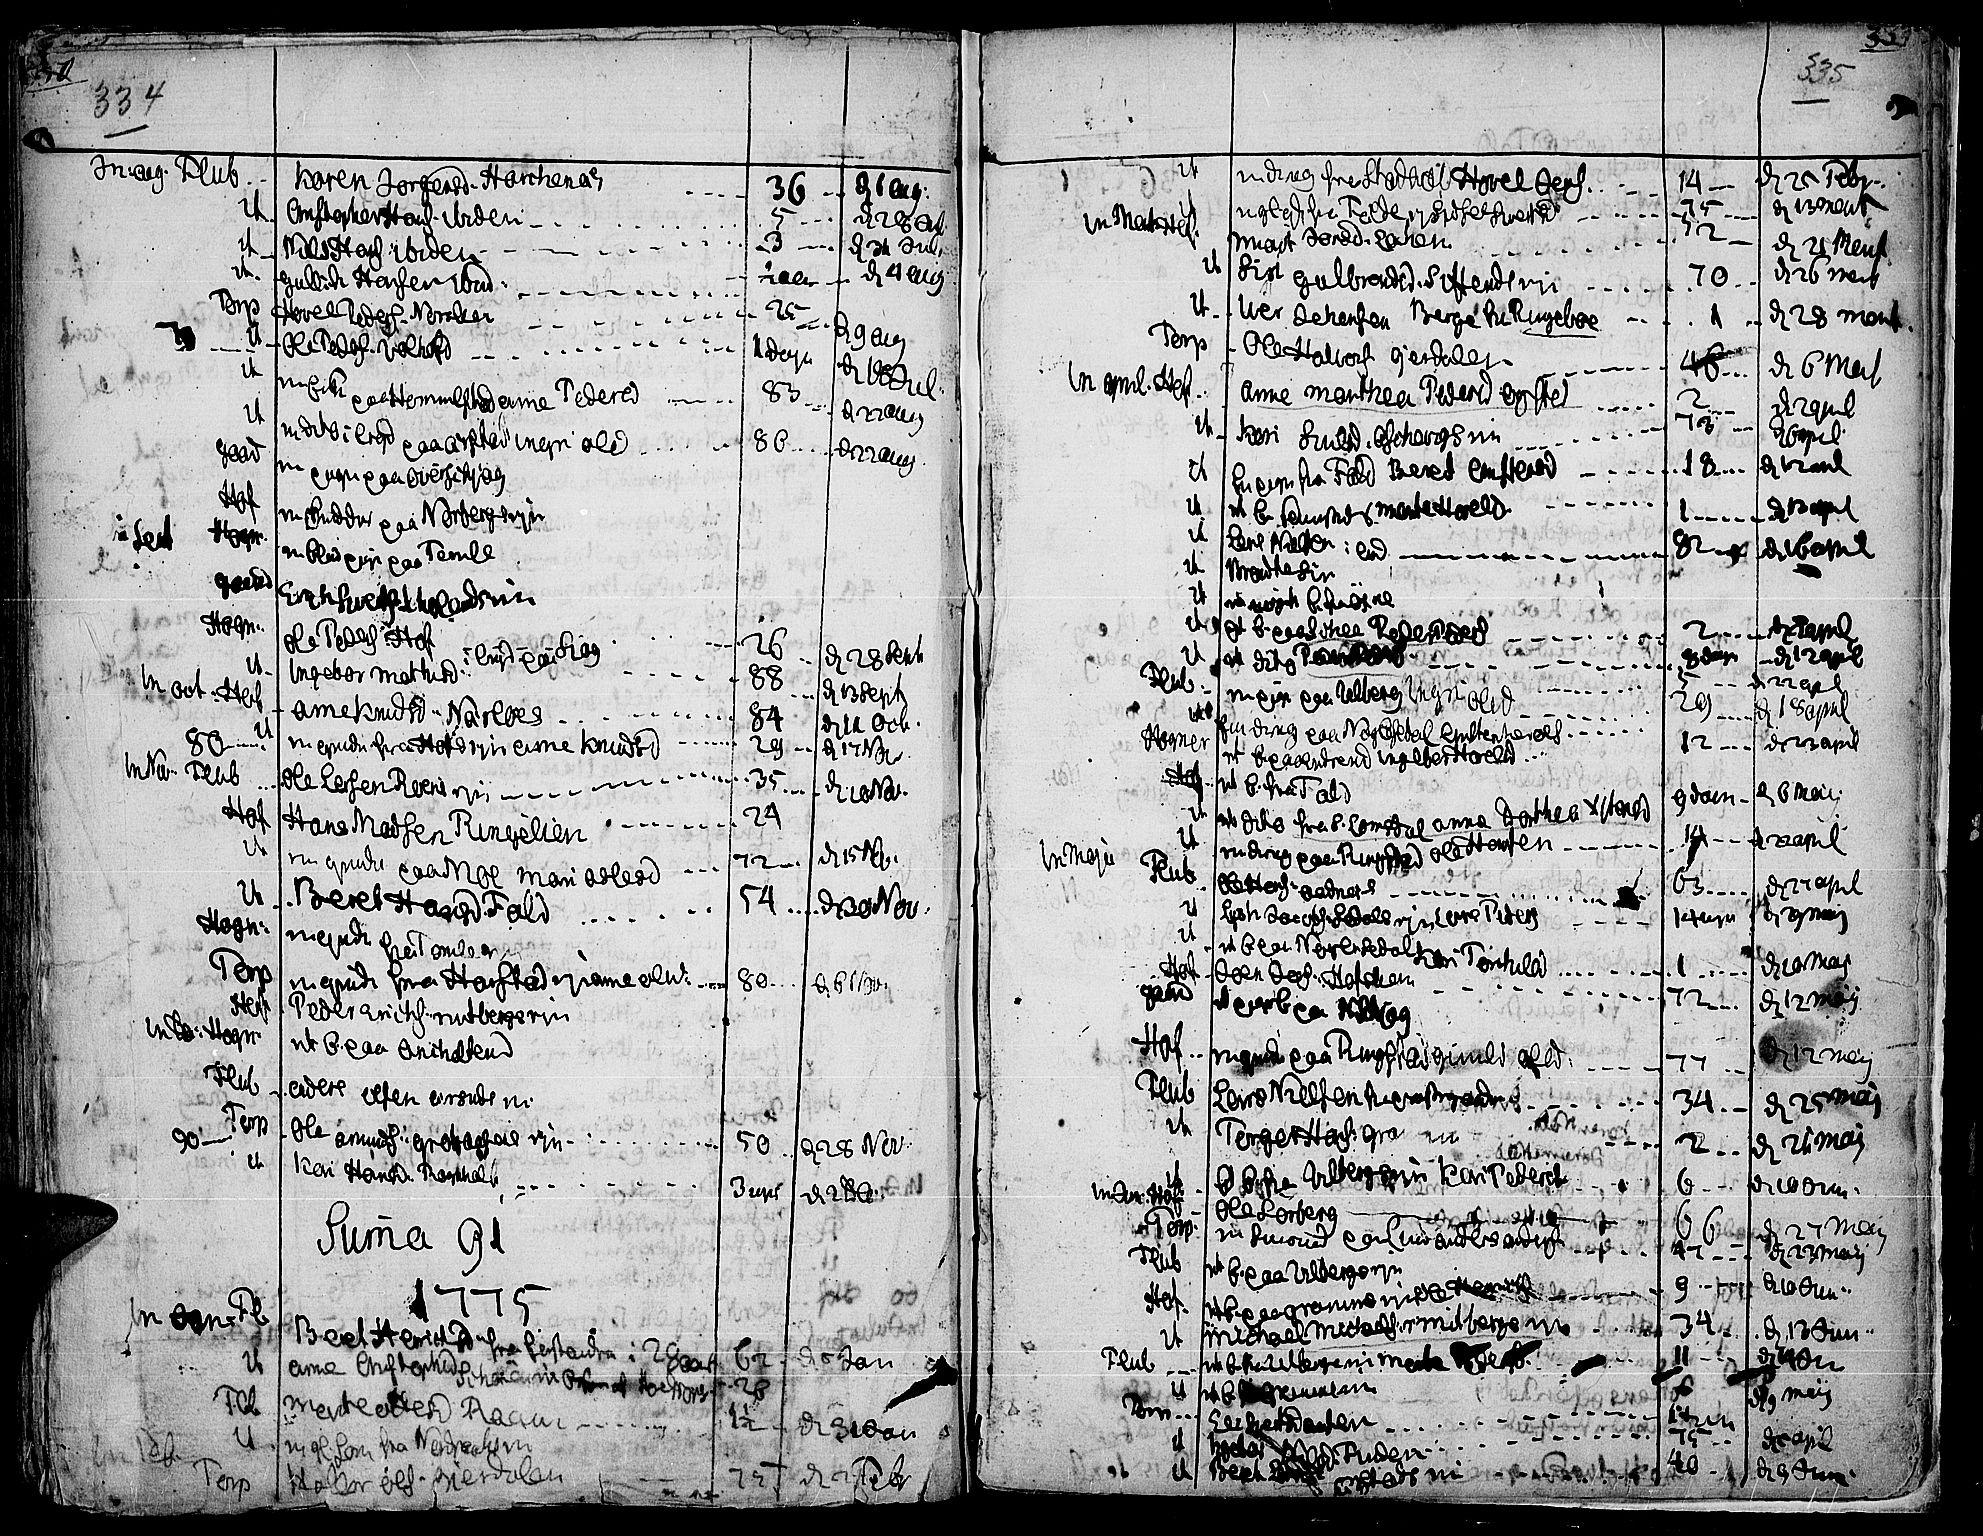 SAH, Land prestekontor, Ministerialbok nr. 5, 1765-1784, s. 334-335